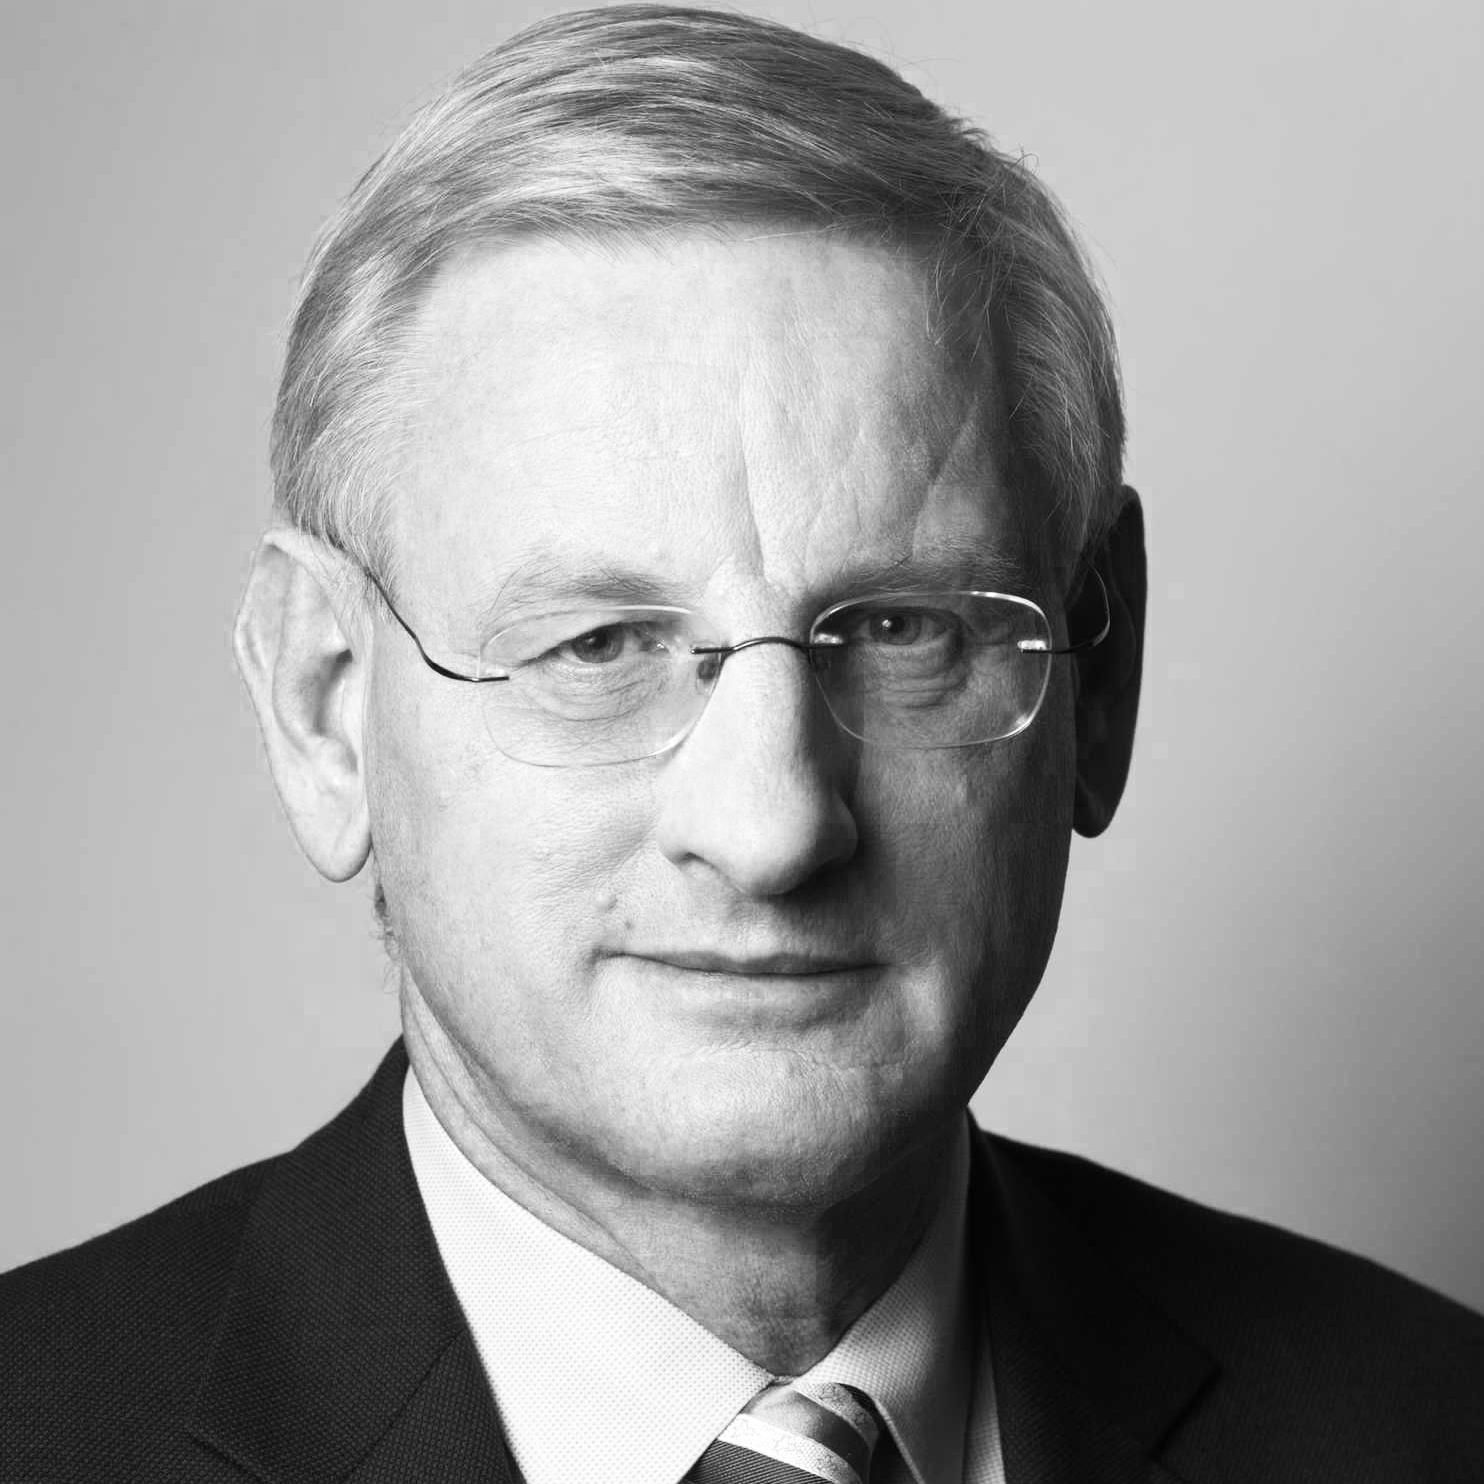 Carl Bildt on Europe In 60 Seconds